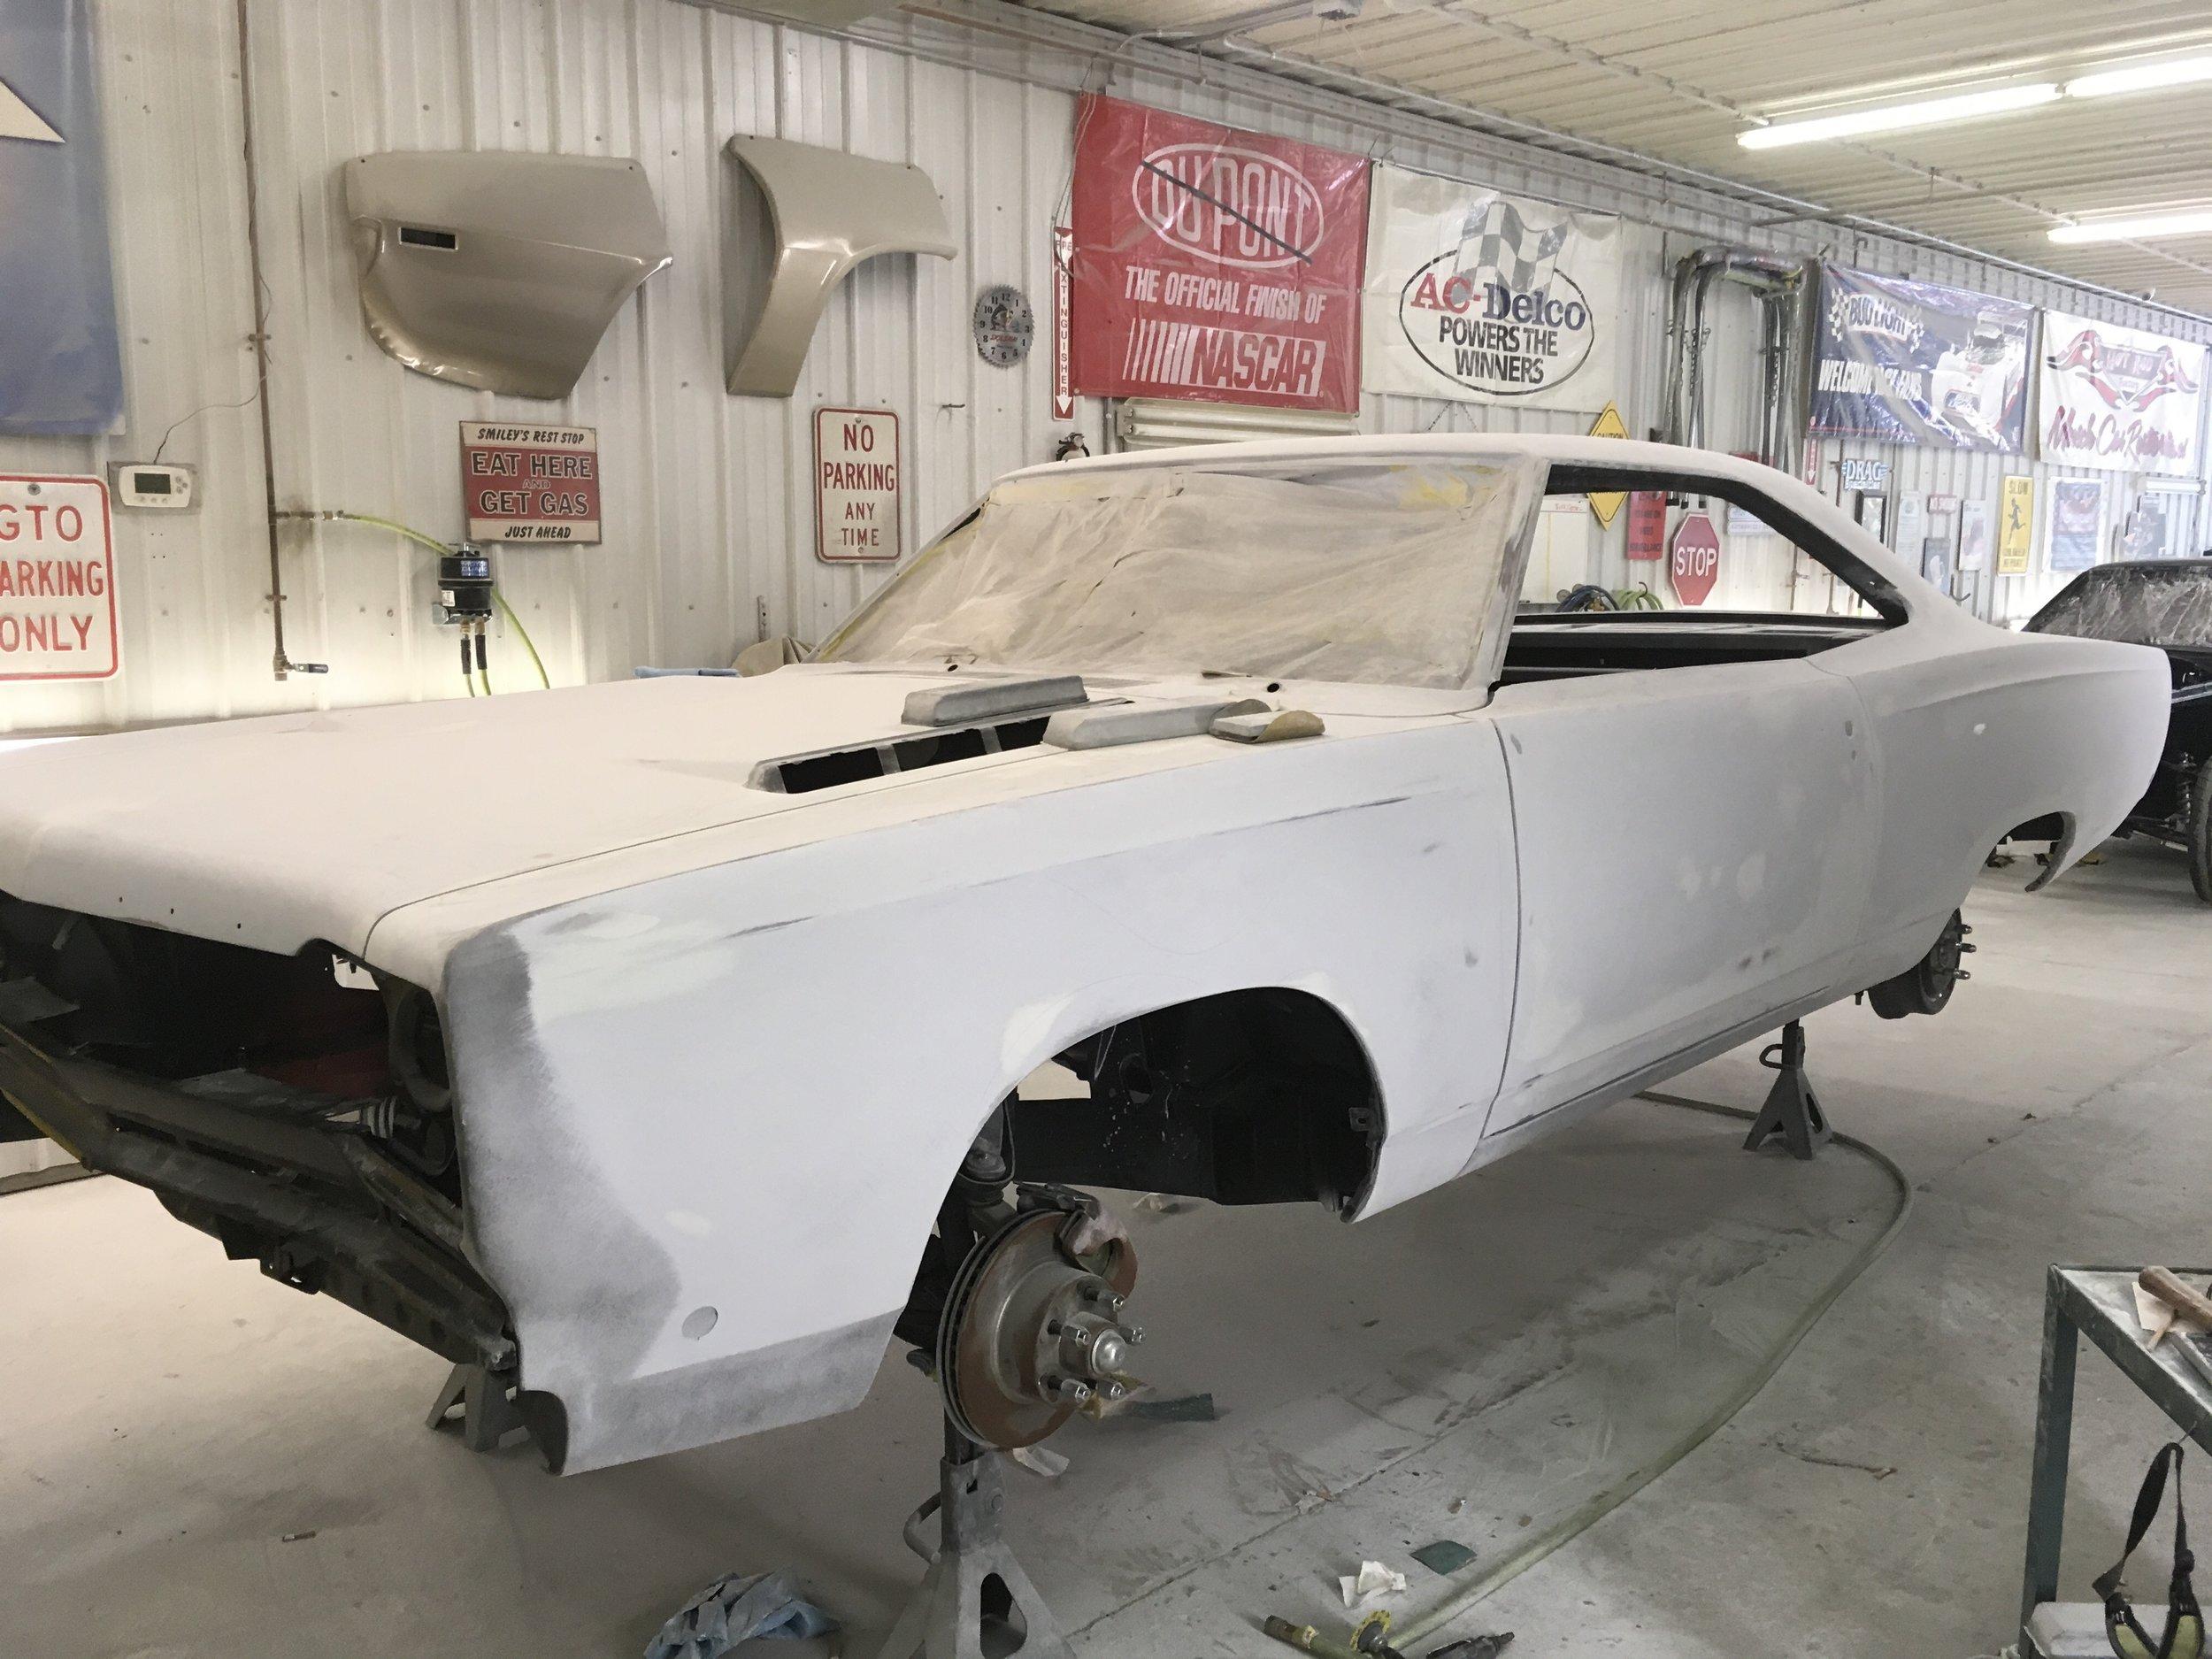 1968-Plymouth-GTX-minneapolis-custom-built-hot-rod-restoration-painting-and-body-work.jpg